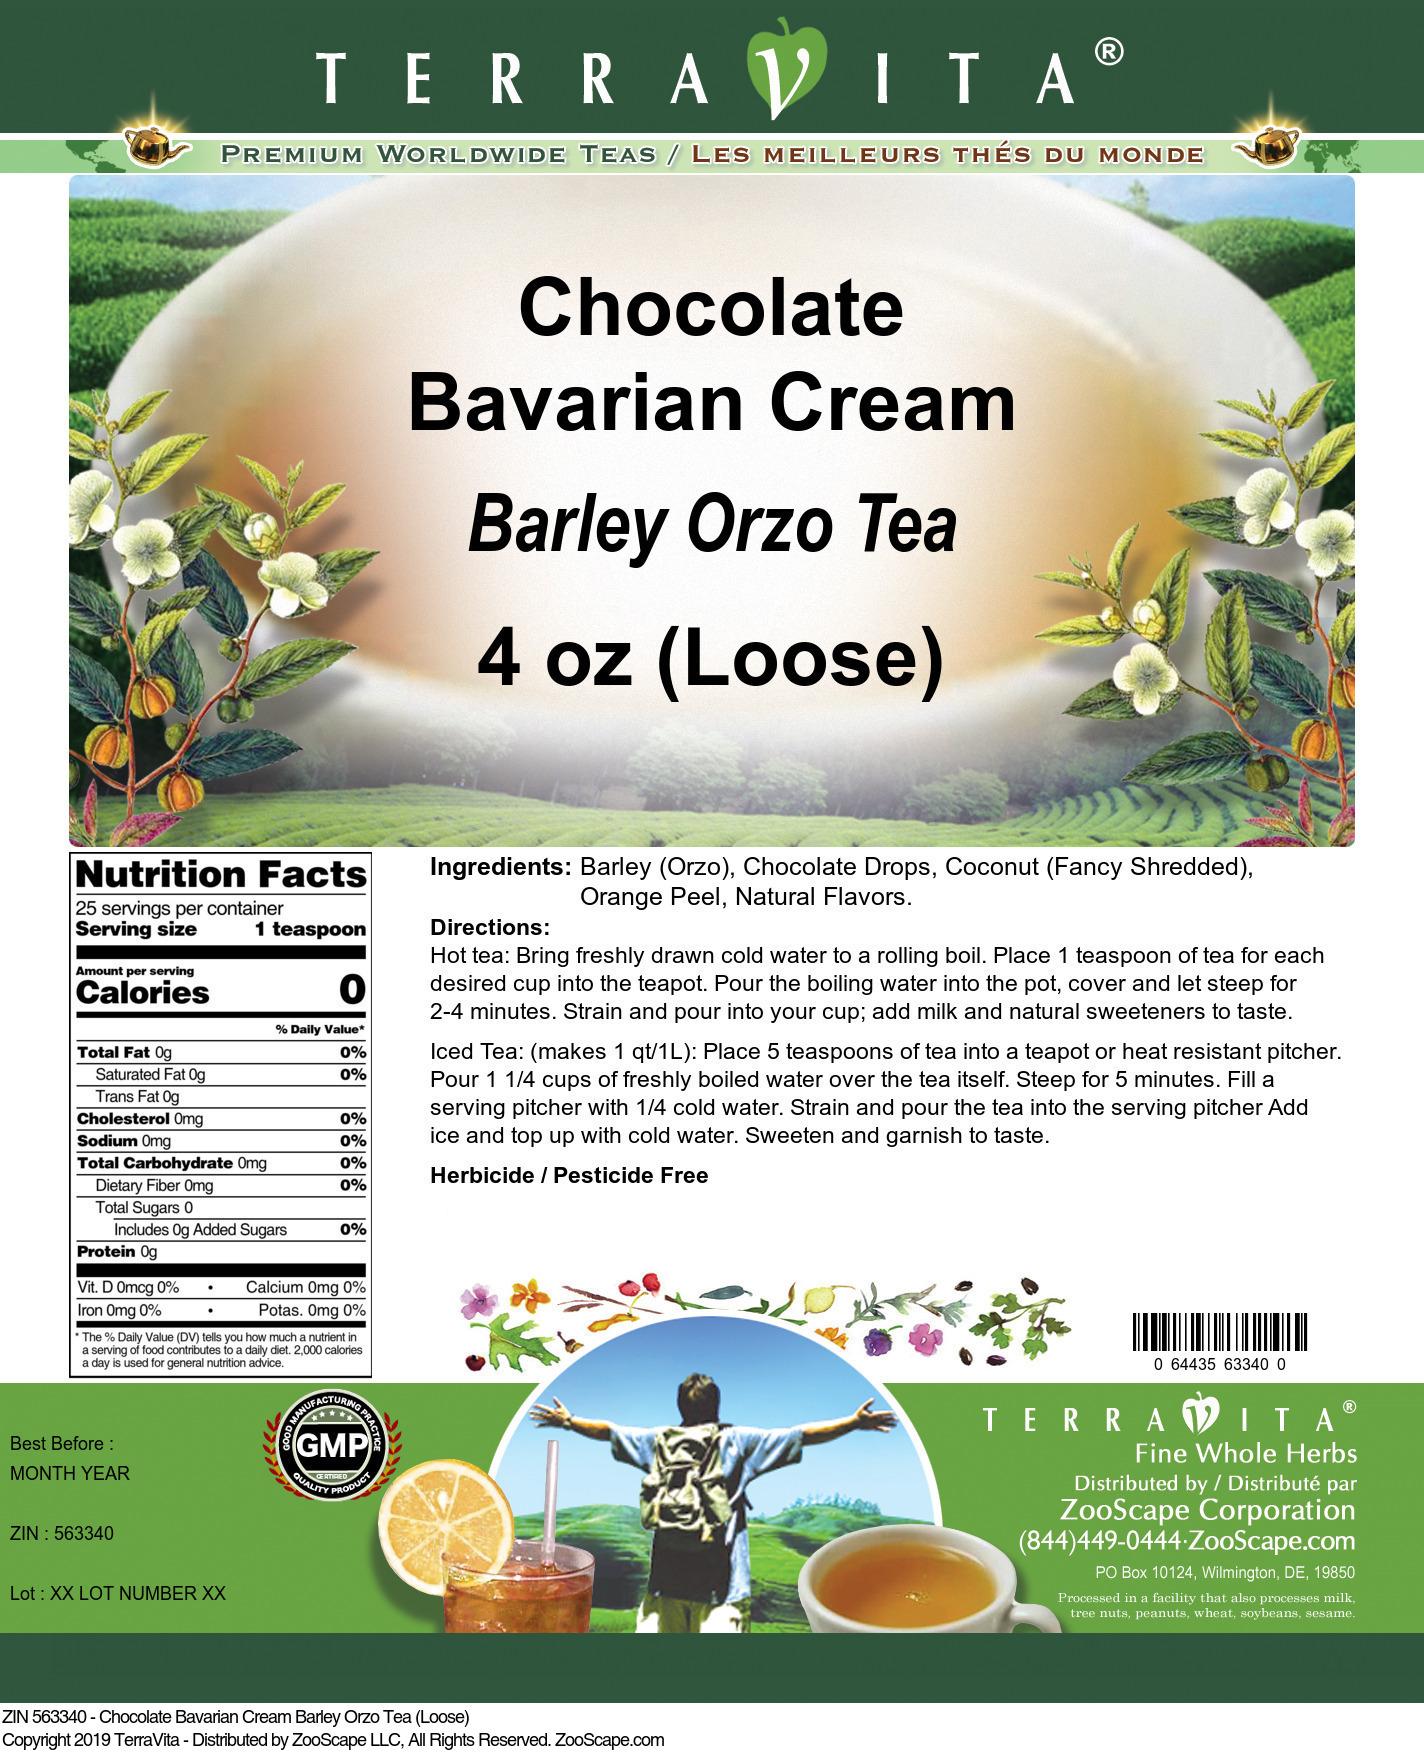 Chocolate Bavarian Cream Barley Orzo